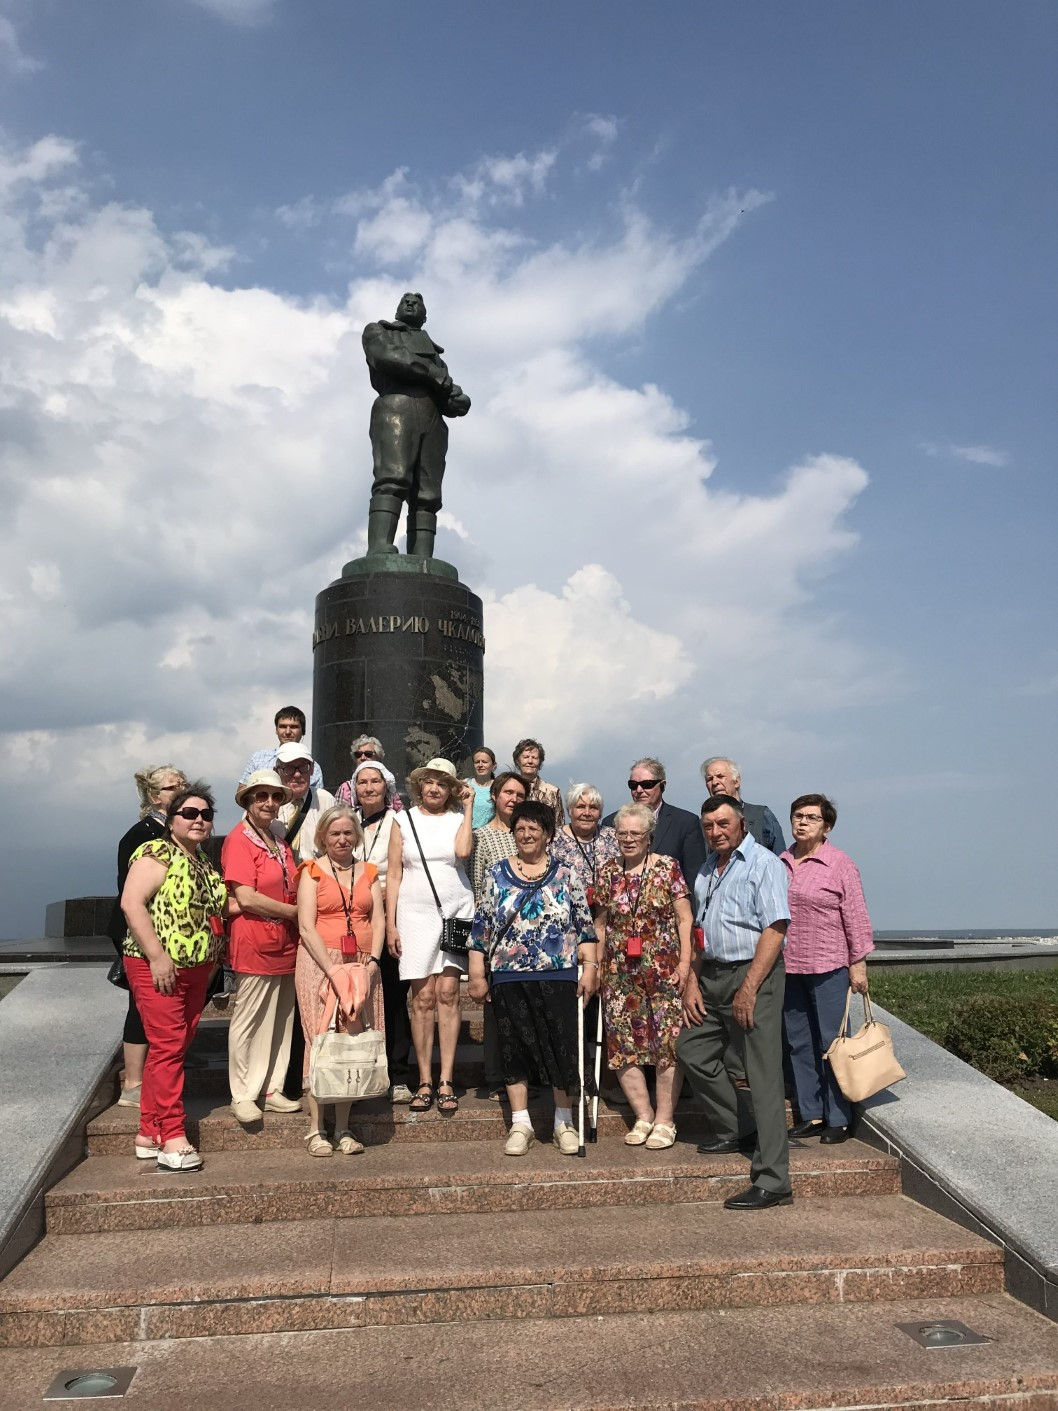 Знакомьтесь: Нижний Новгород.